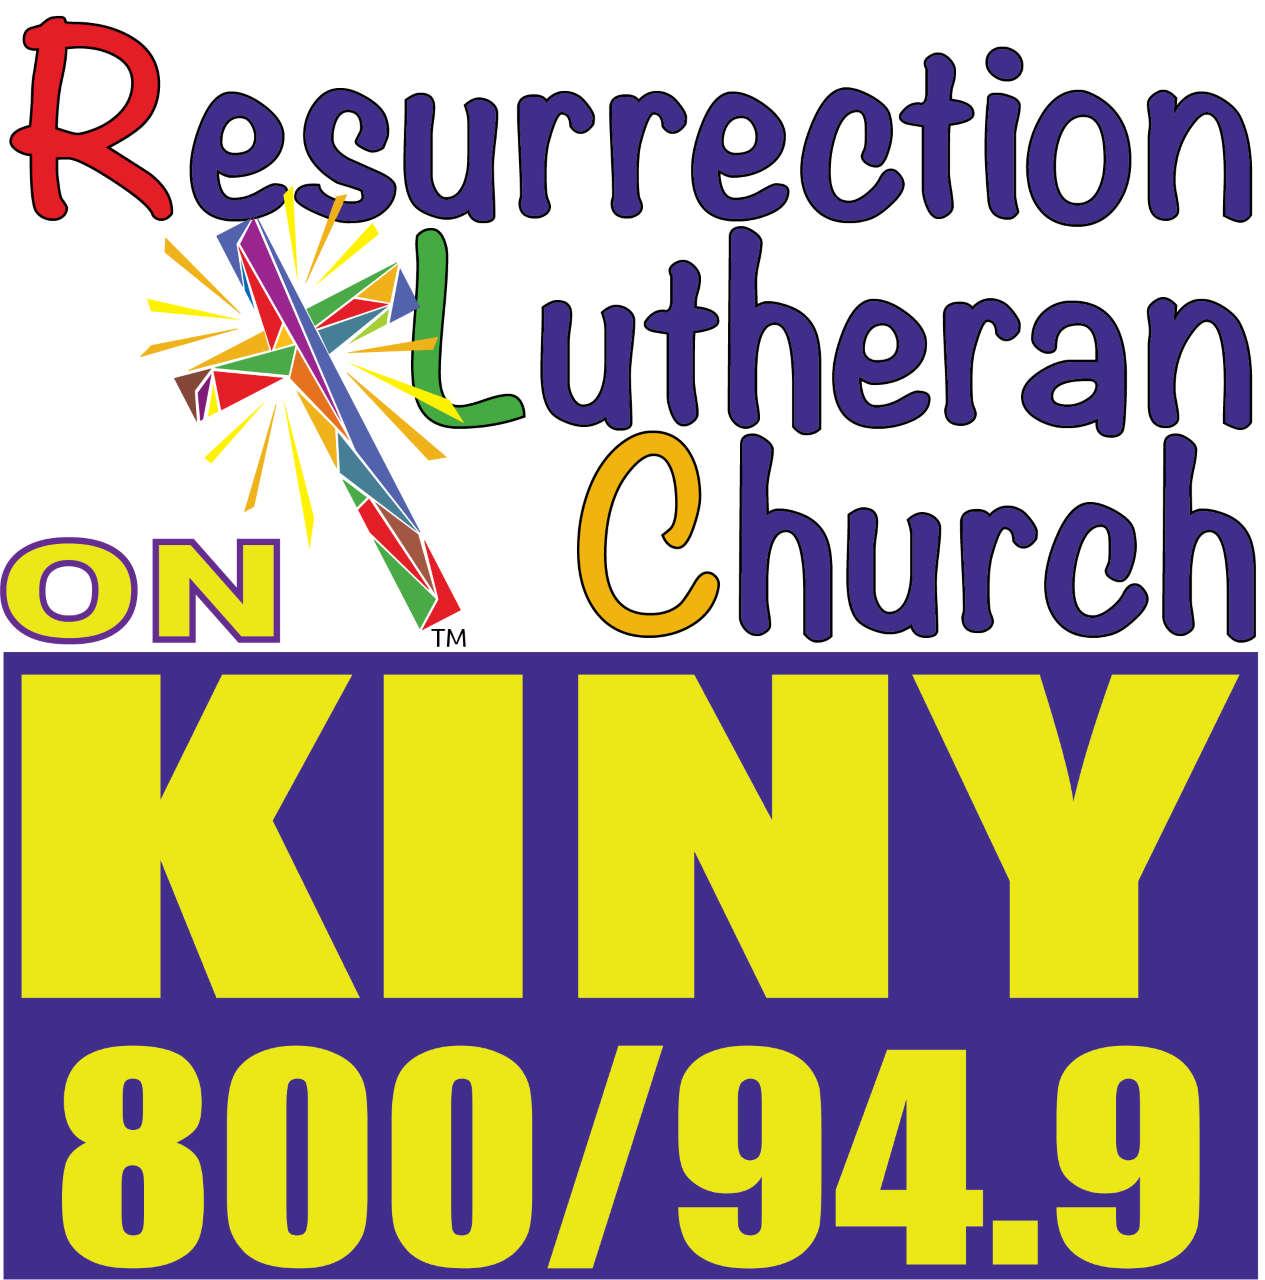 Resurrection Lutheran Church - Sunday Service